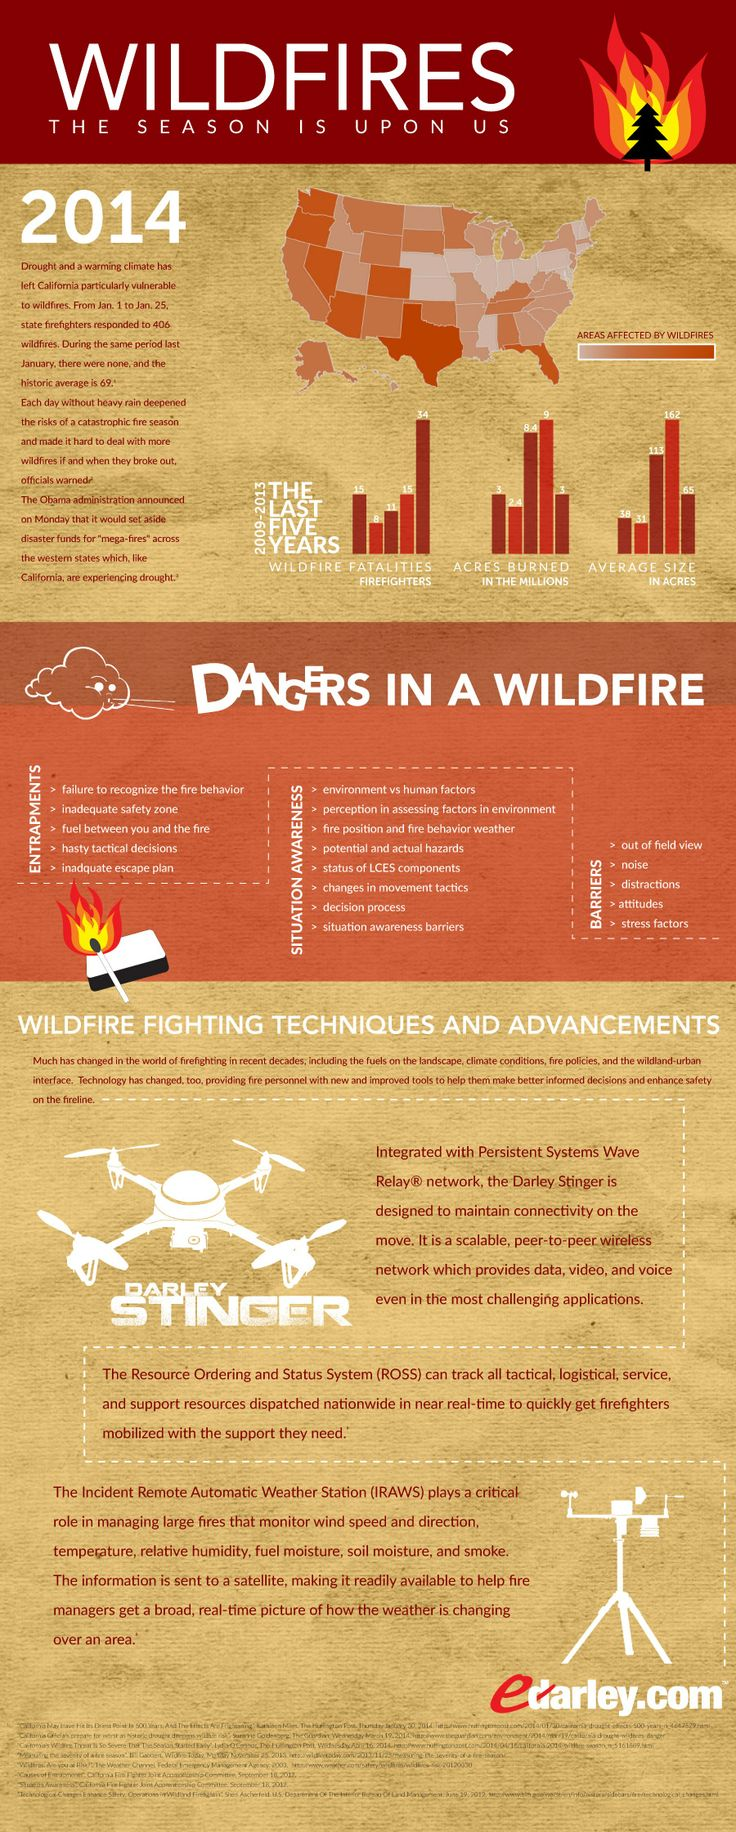 Wildland Wildfire Infographic | eDarley.com  #wildland #wildfire #infographic #edarley